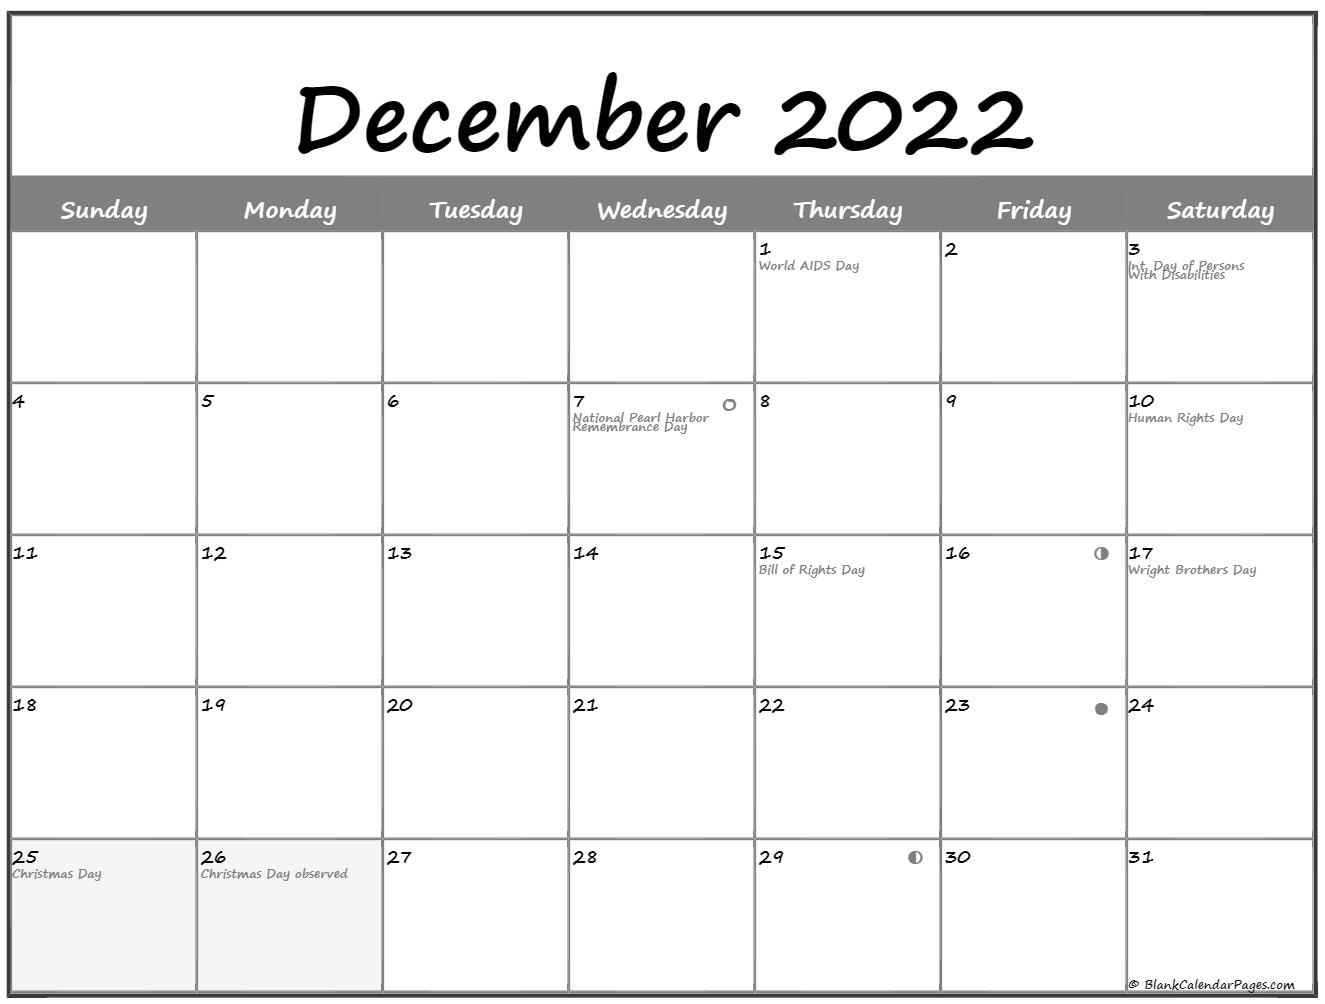 December 2020 Lunar calendar. moon phase calendar with USA holidays